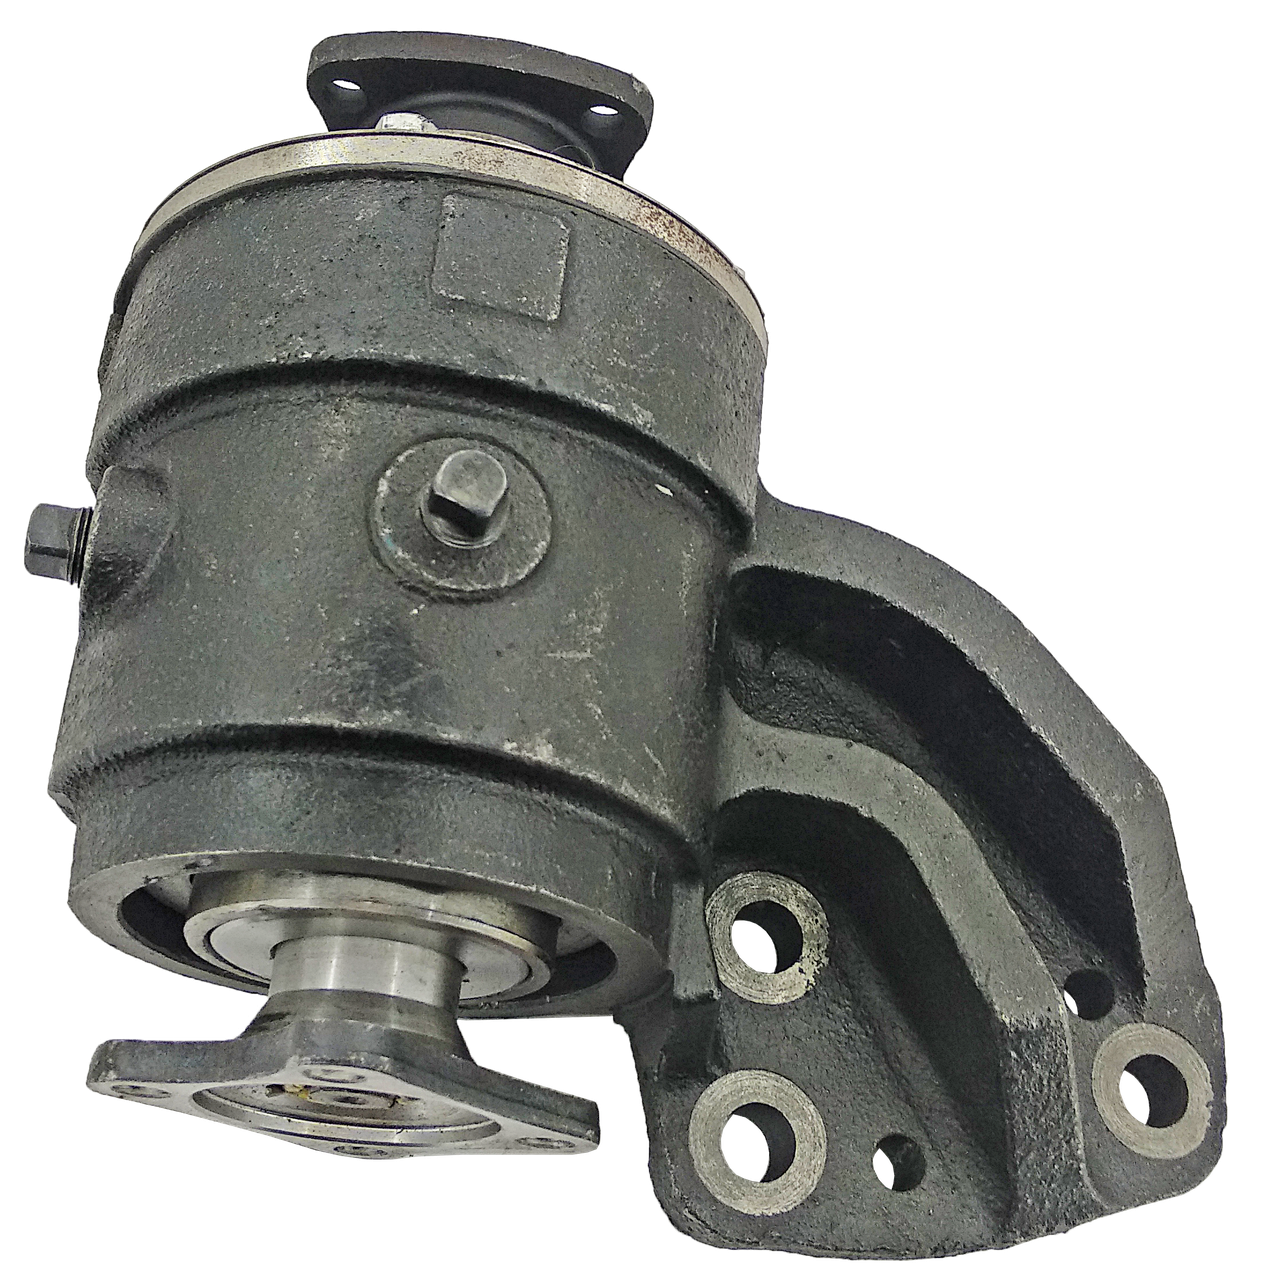 Опора вала карданного МТЗ промежуточная 72-2209010